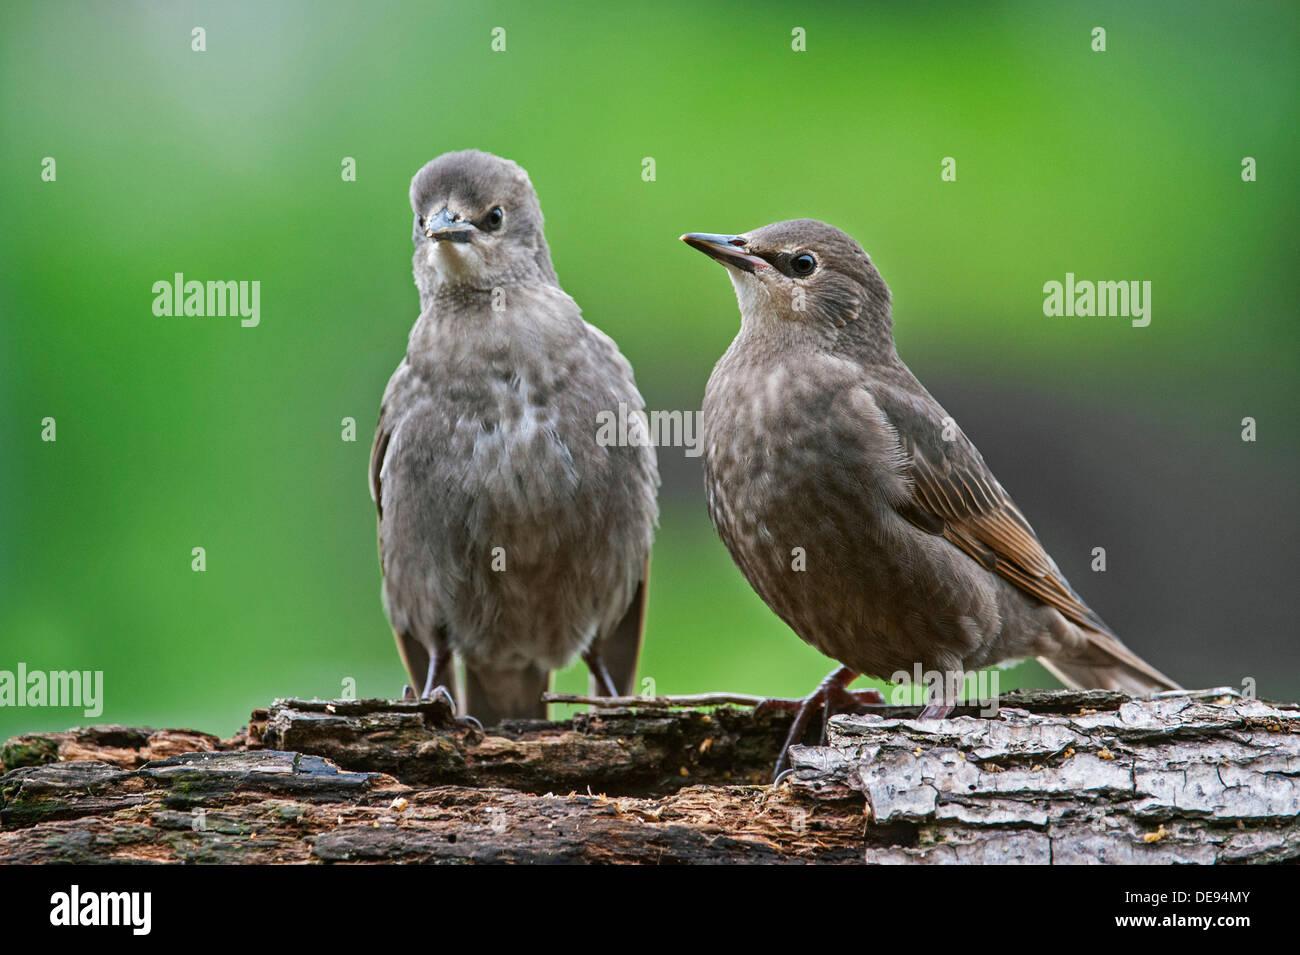 Two Common Starling / European starlings (Sturnus vulgaris) fledglings perched in tree in spring - Stock Image